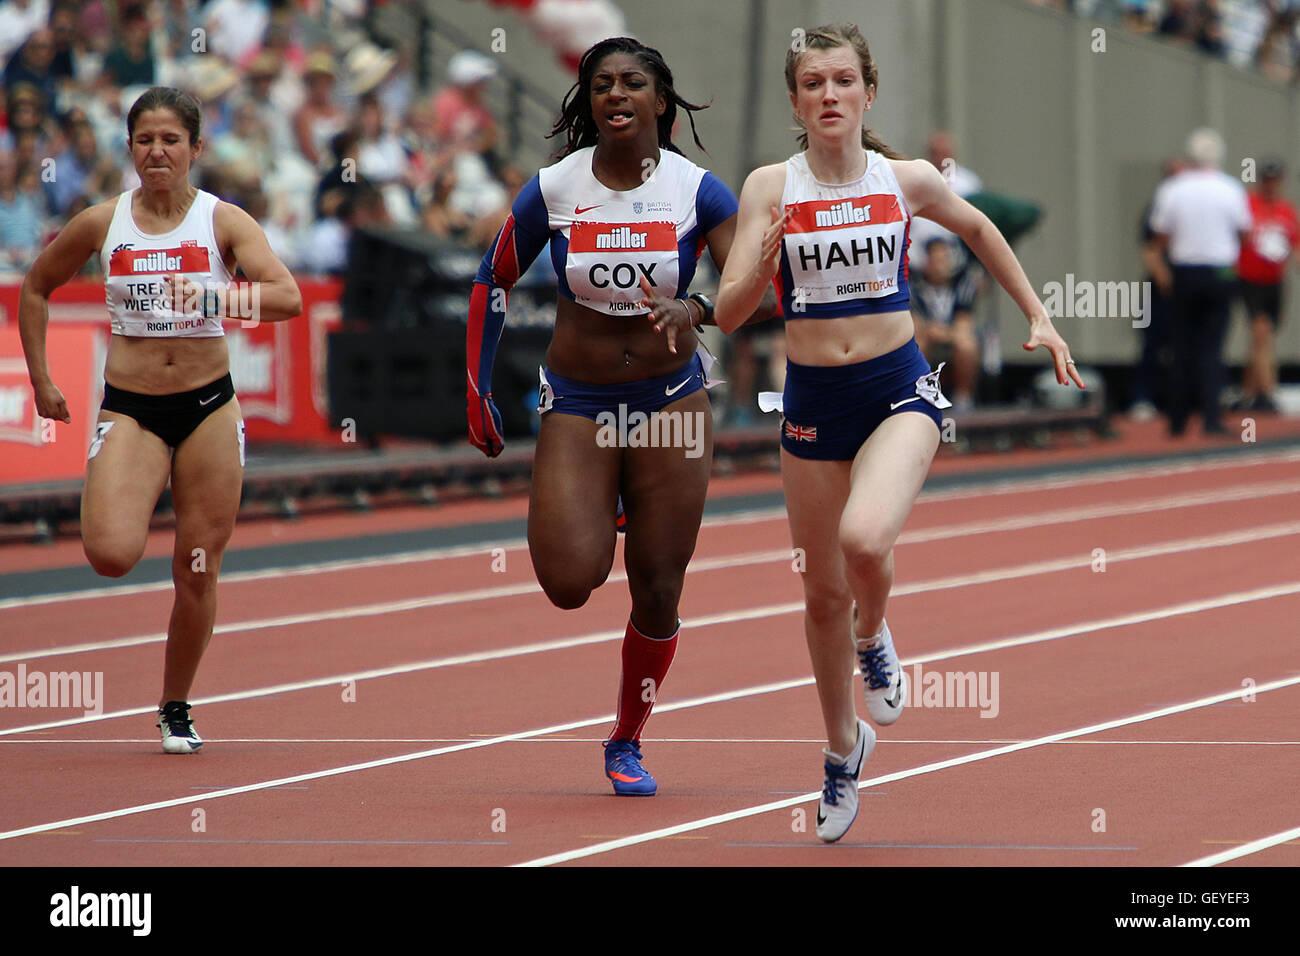 Sophie hahn gb winning the 100m women t38 2016 müller anniversary